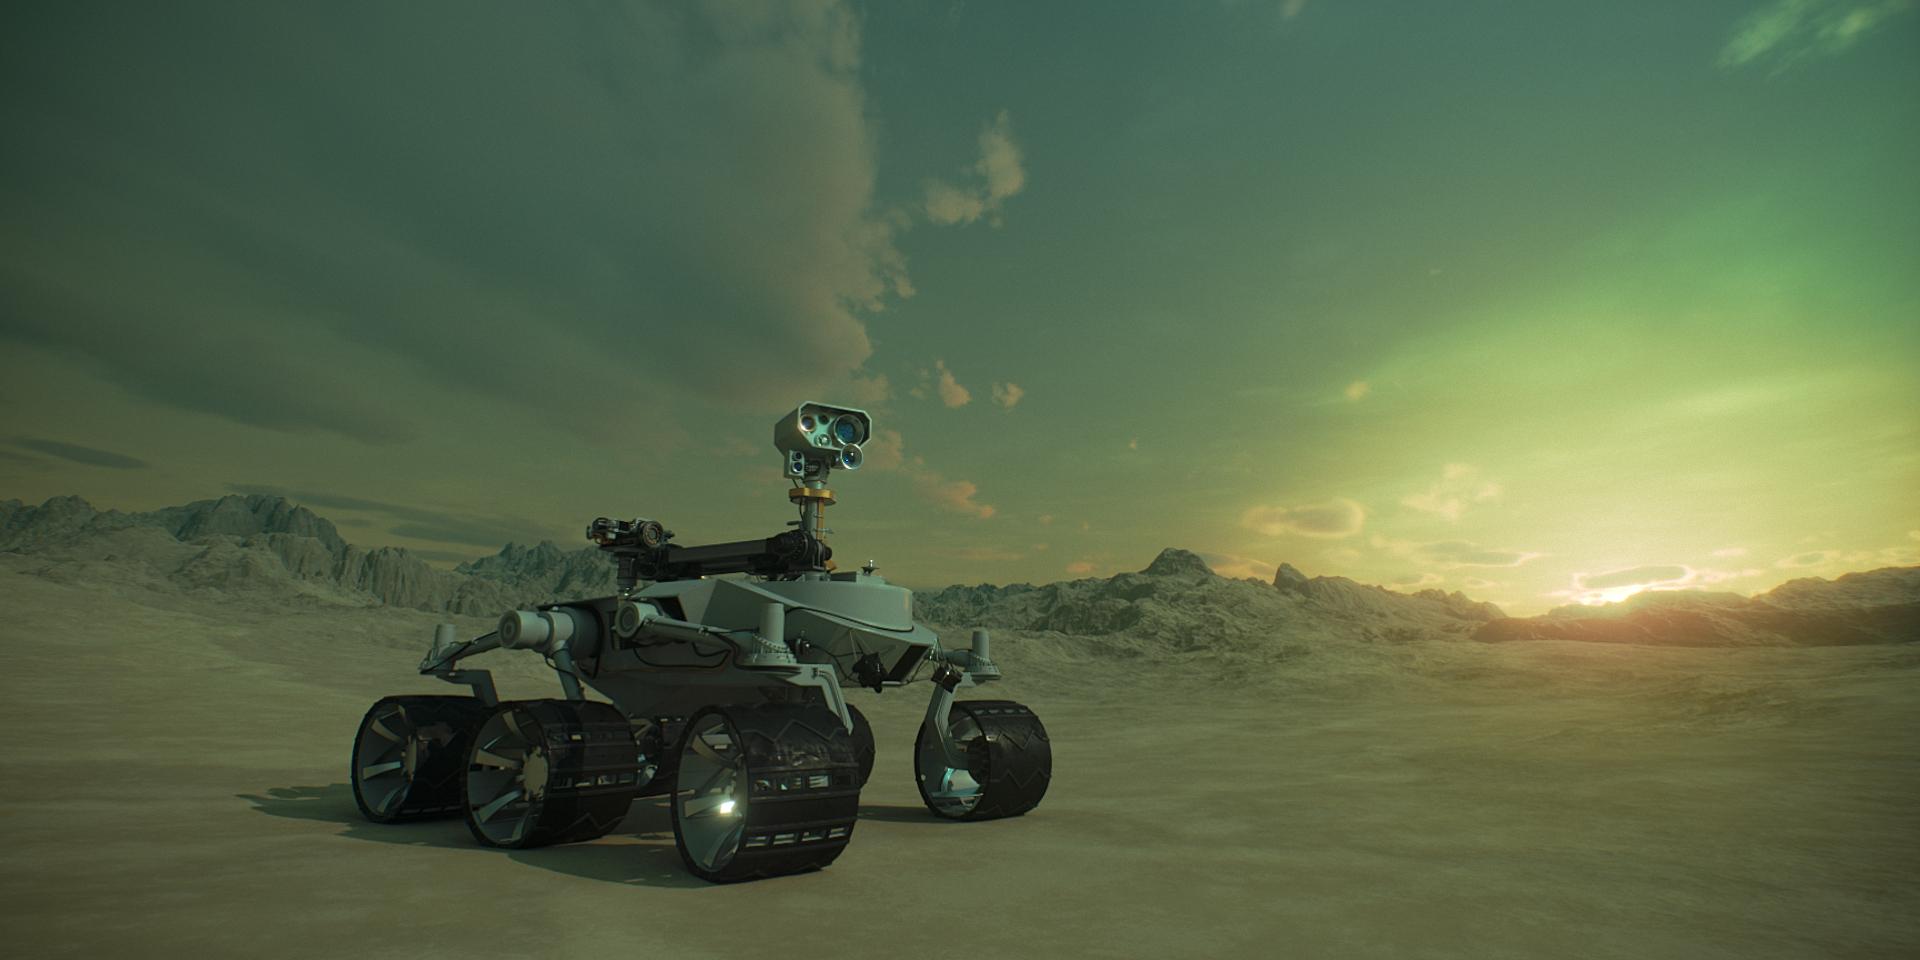 Rover Scene Alien Skies 10 Camera A.jpg